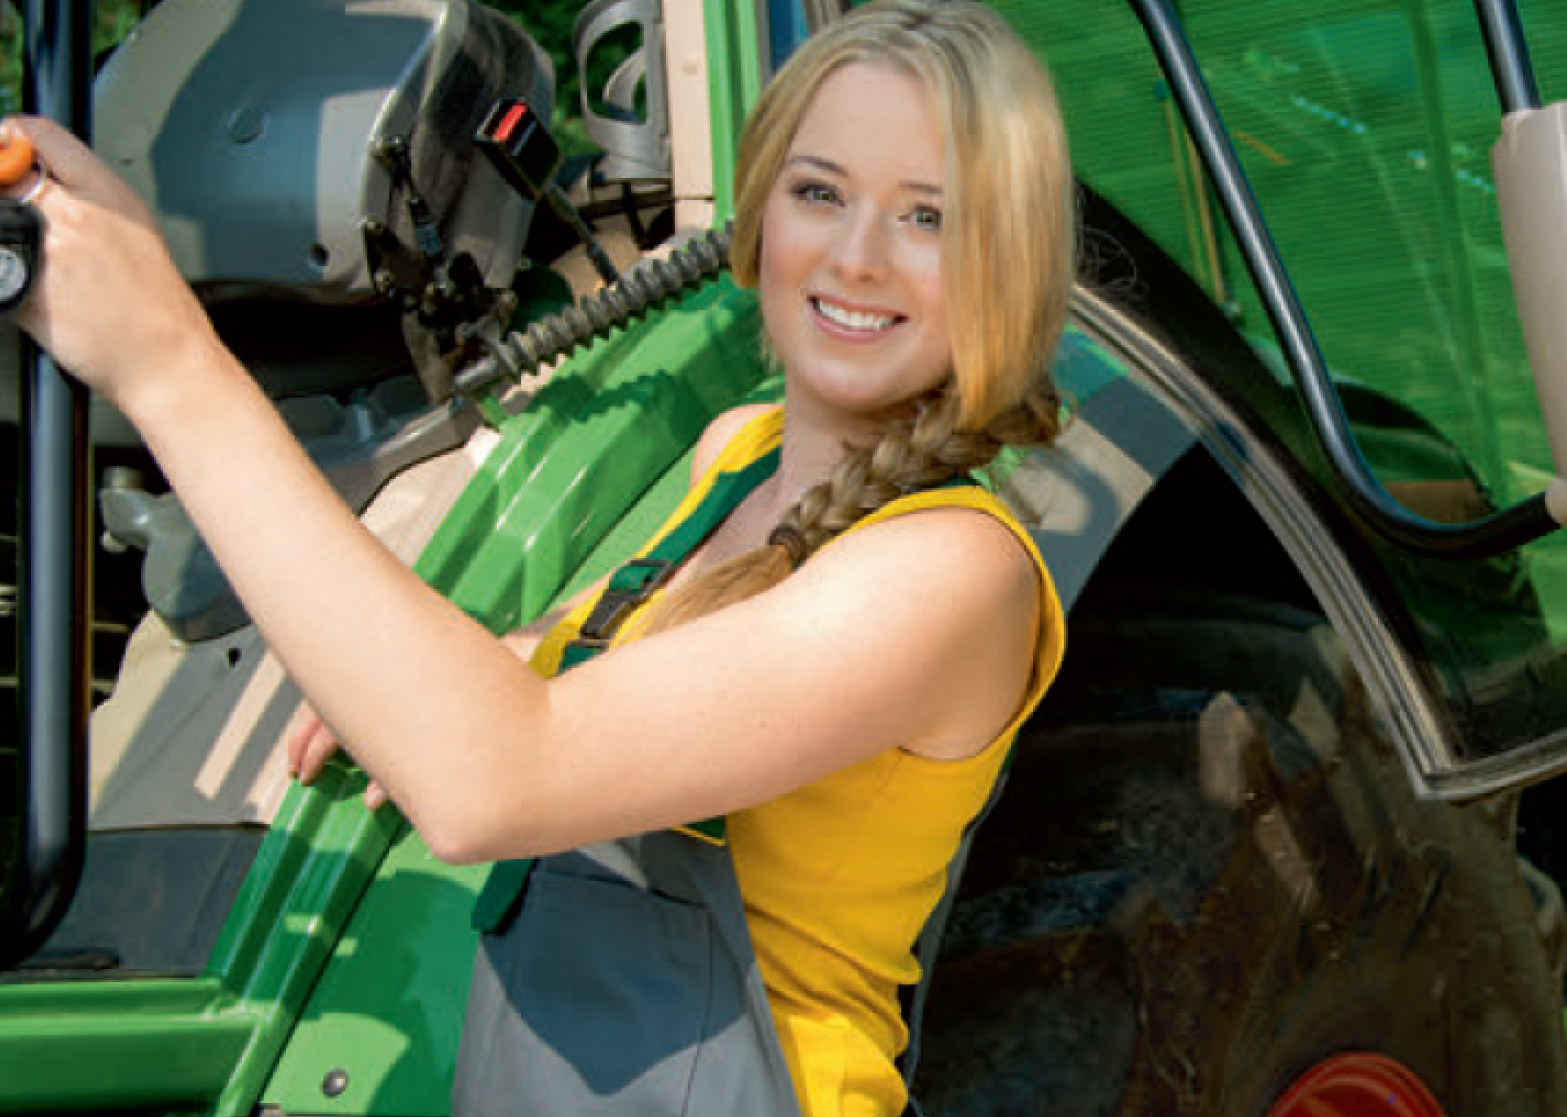 Maschinenring-Fotokalender: Landfrauen als Powerfrauen